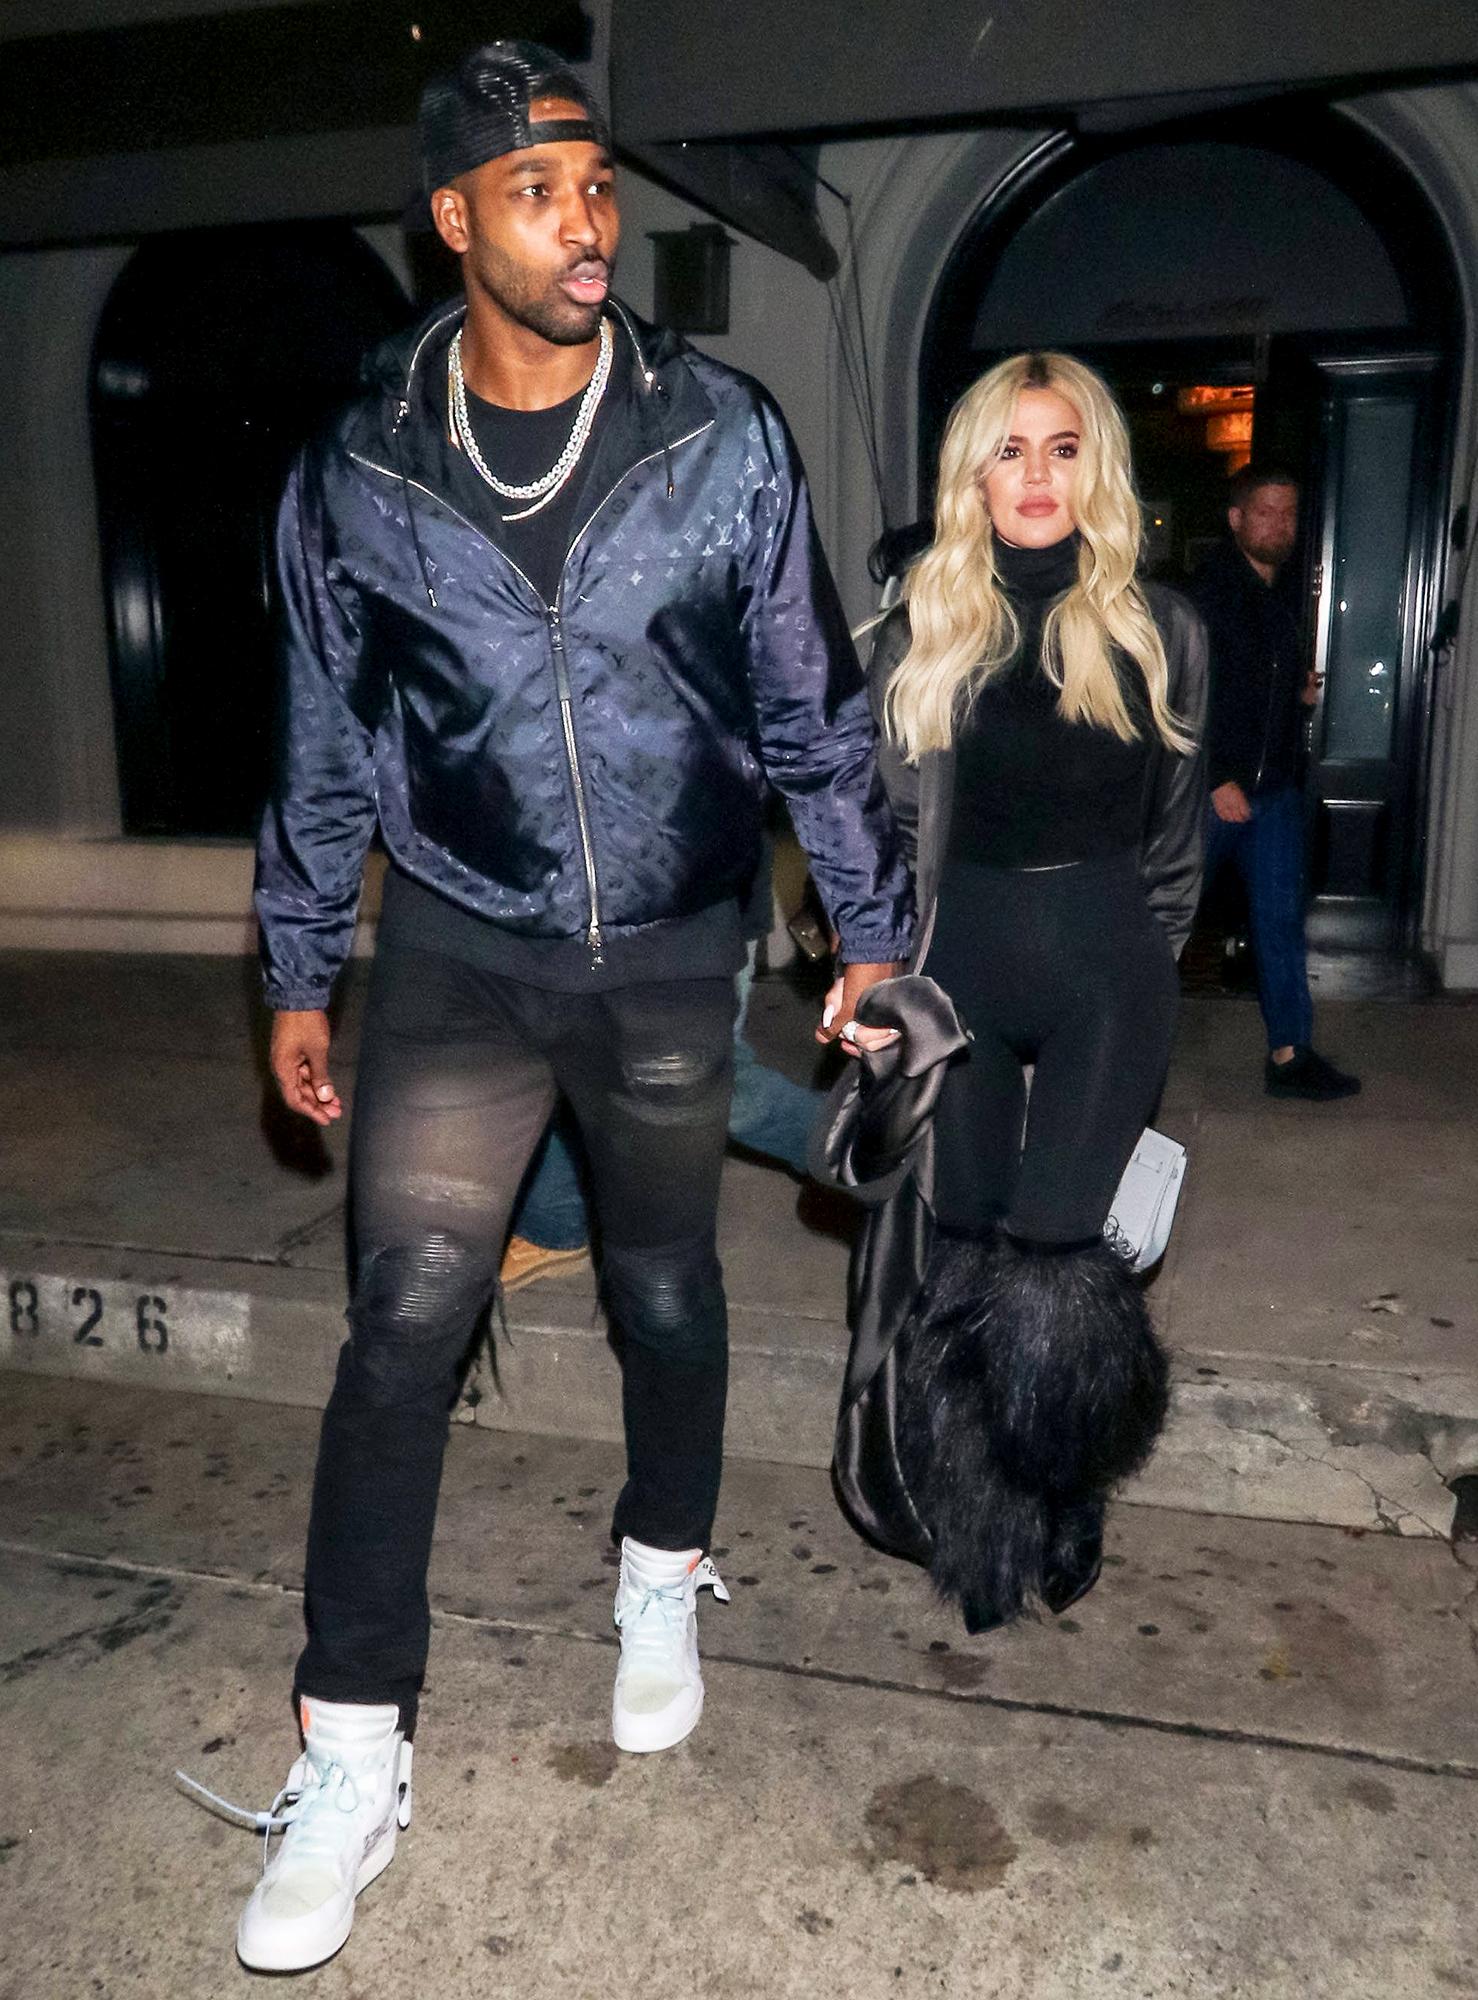 Khloe-Kardashian-not-rushing-to-date-post-split-Tristan-Thompson